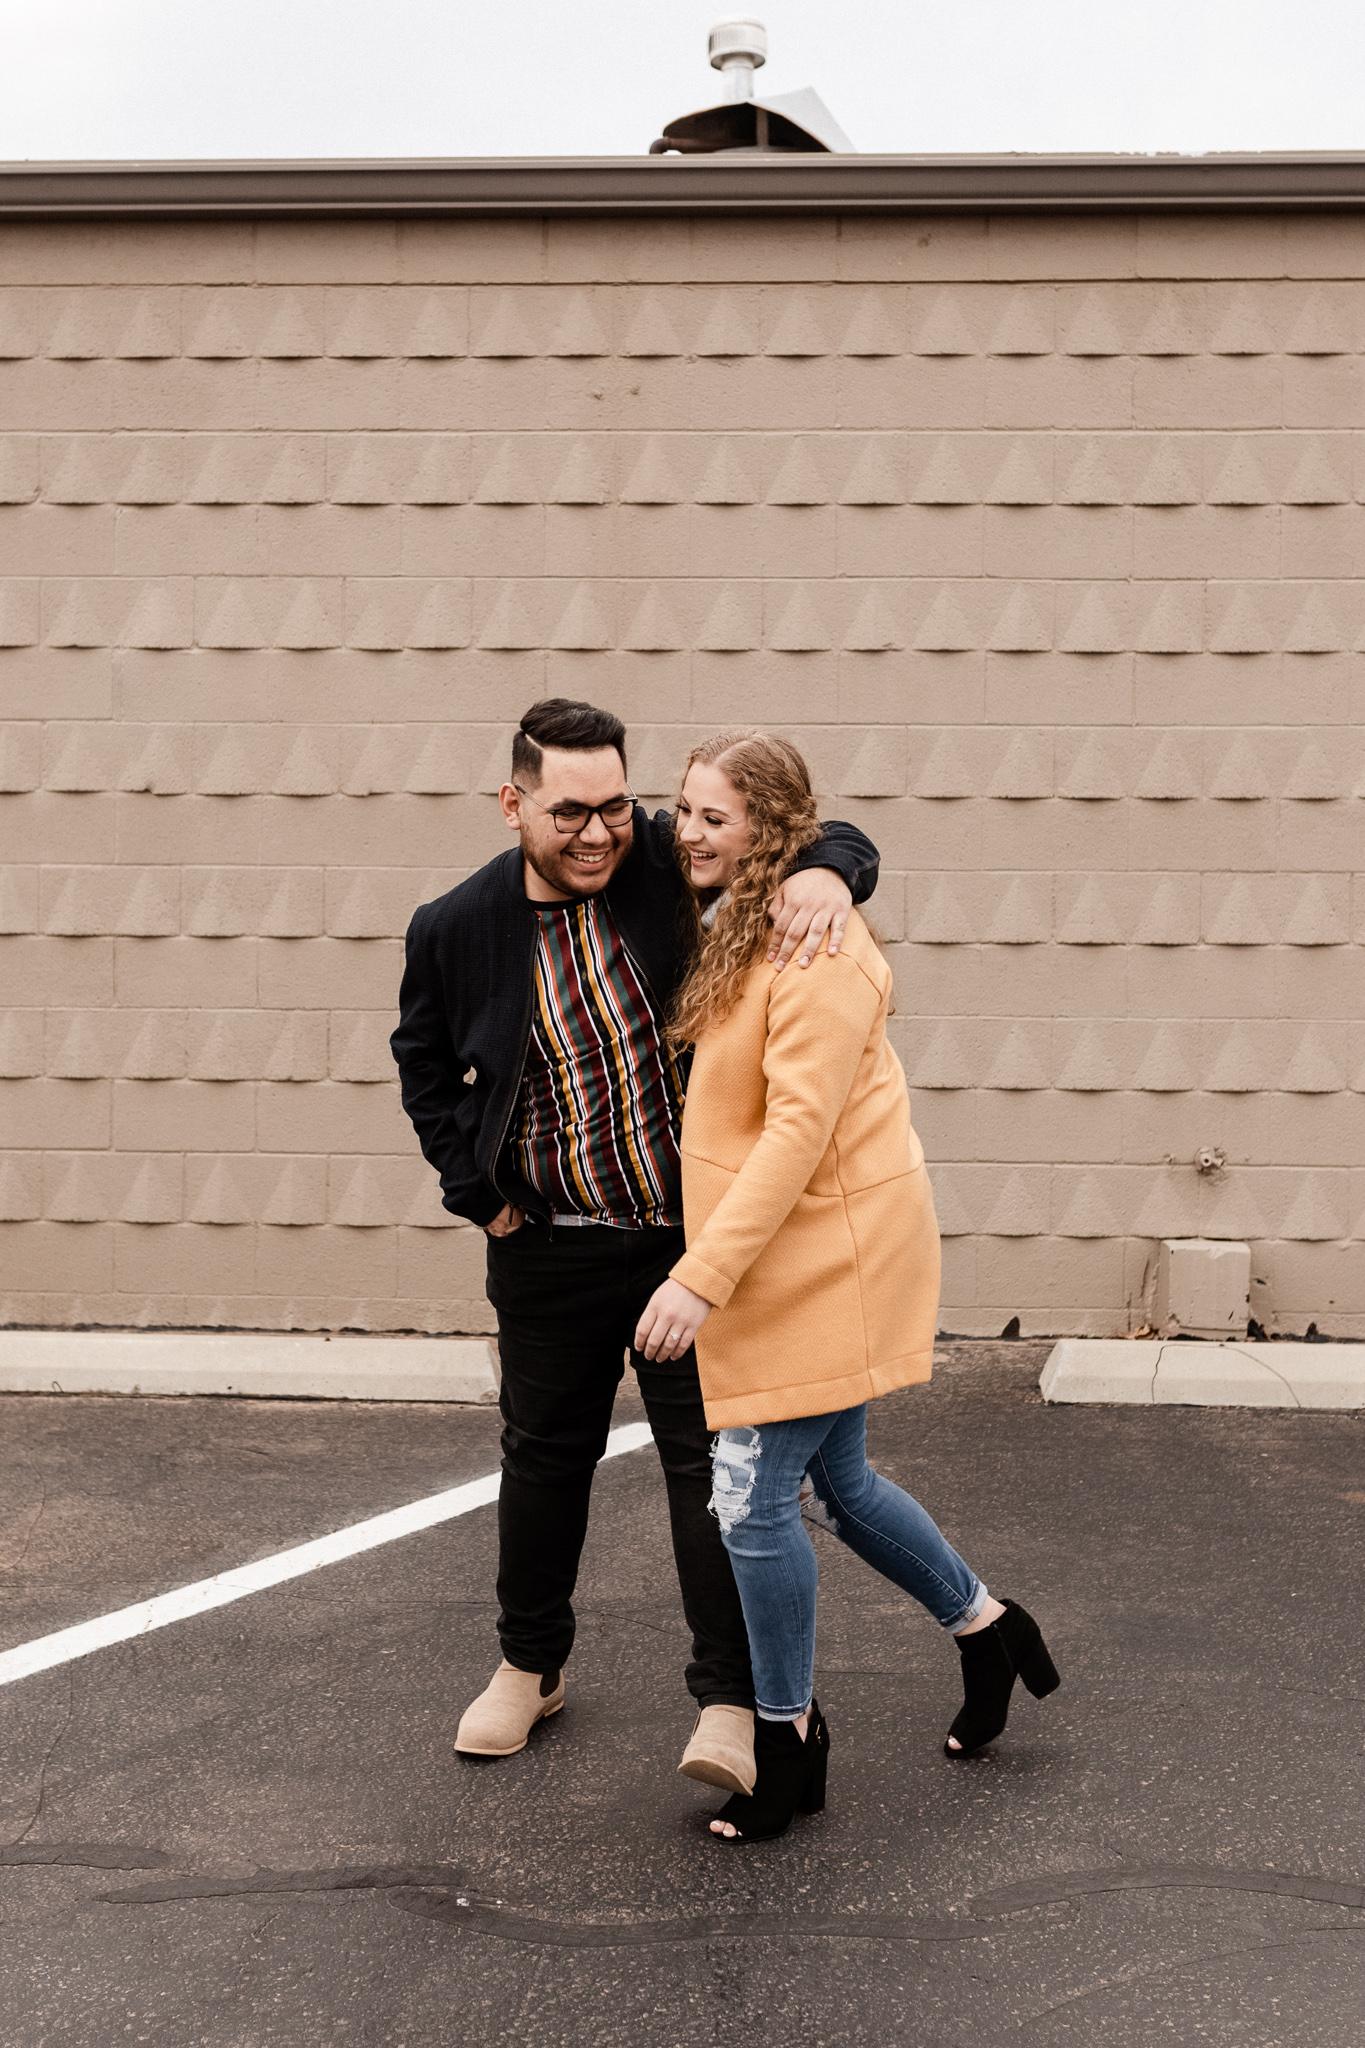 Galindo Engagements-Oklahoma Wedding Photographer-1.jpg